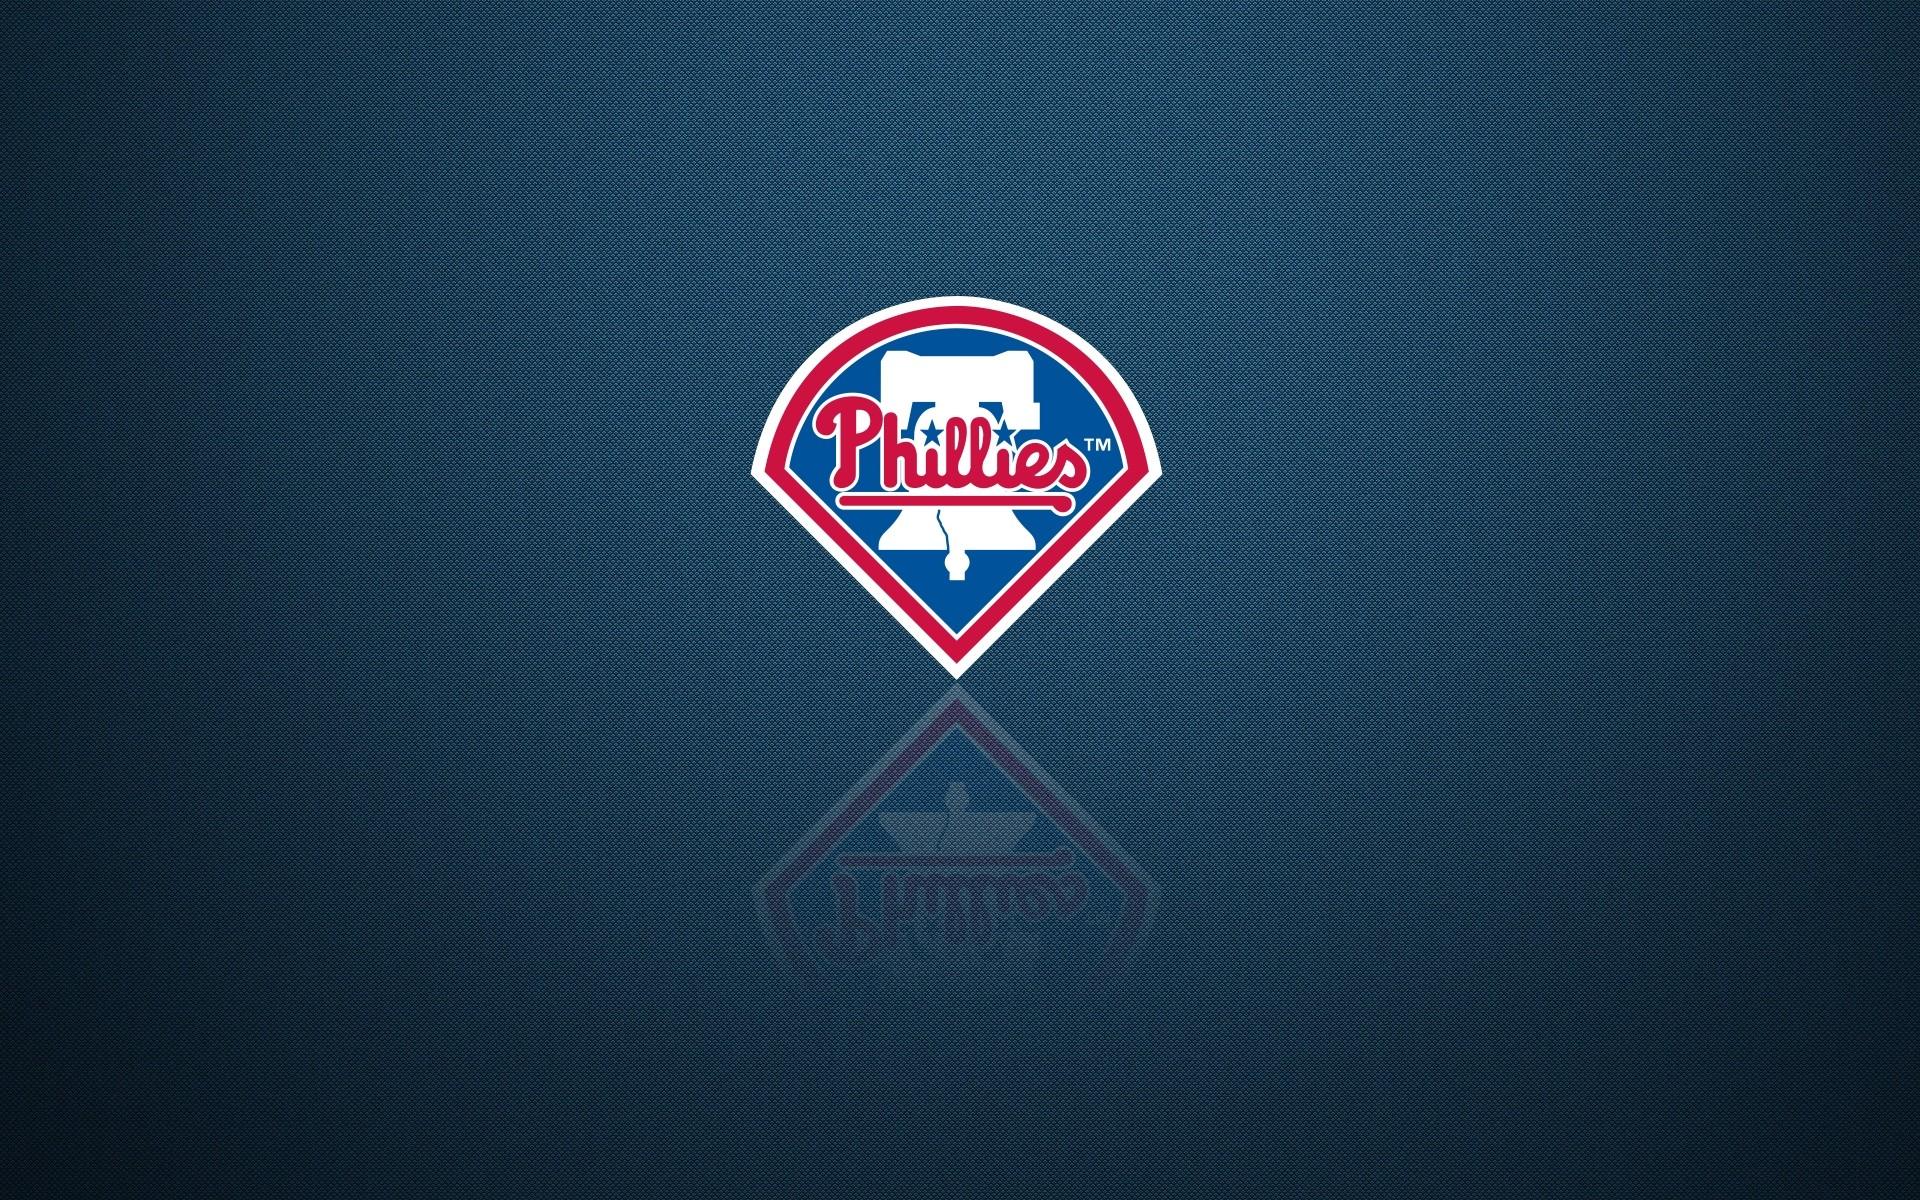 Phillies Logo Wallpaper ·â' WallpaperTag